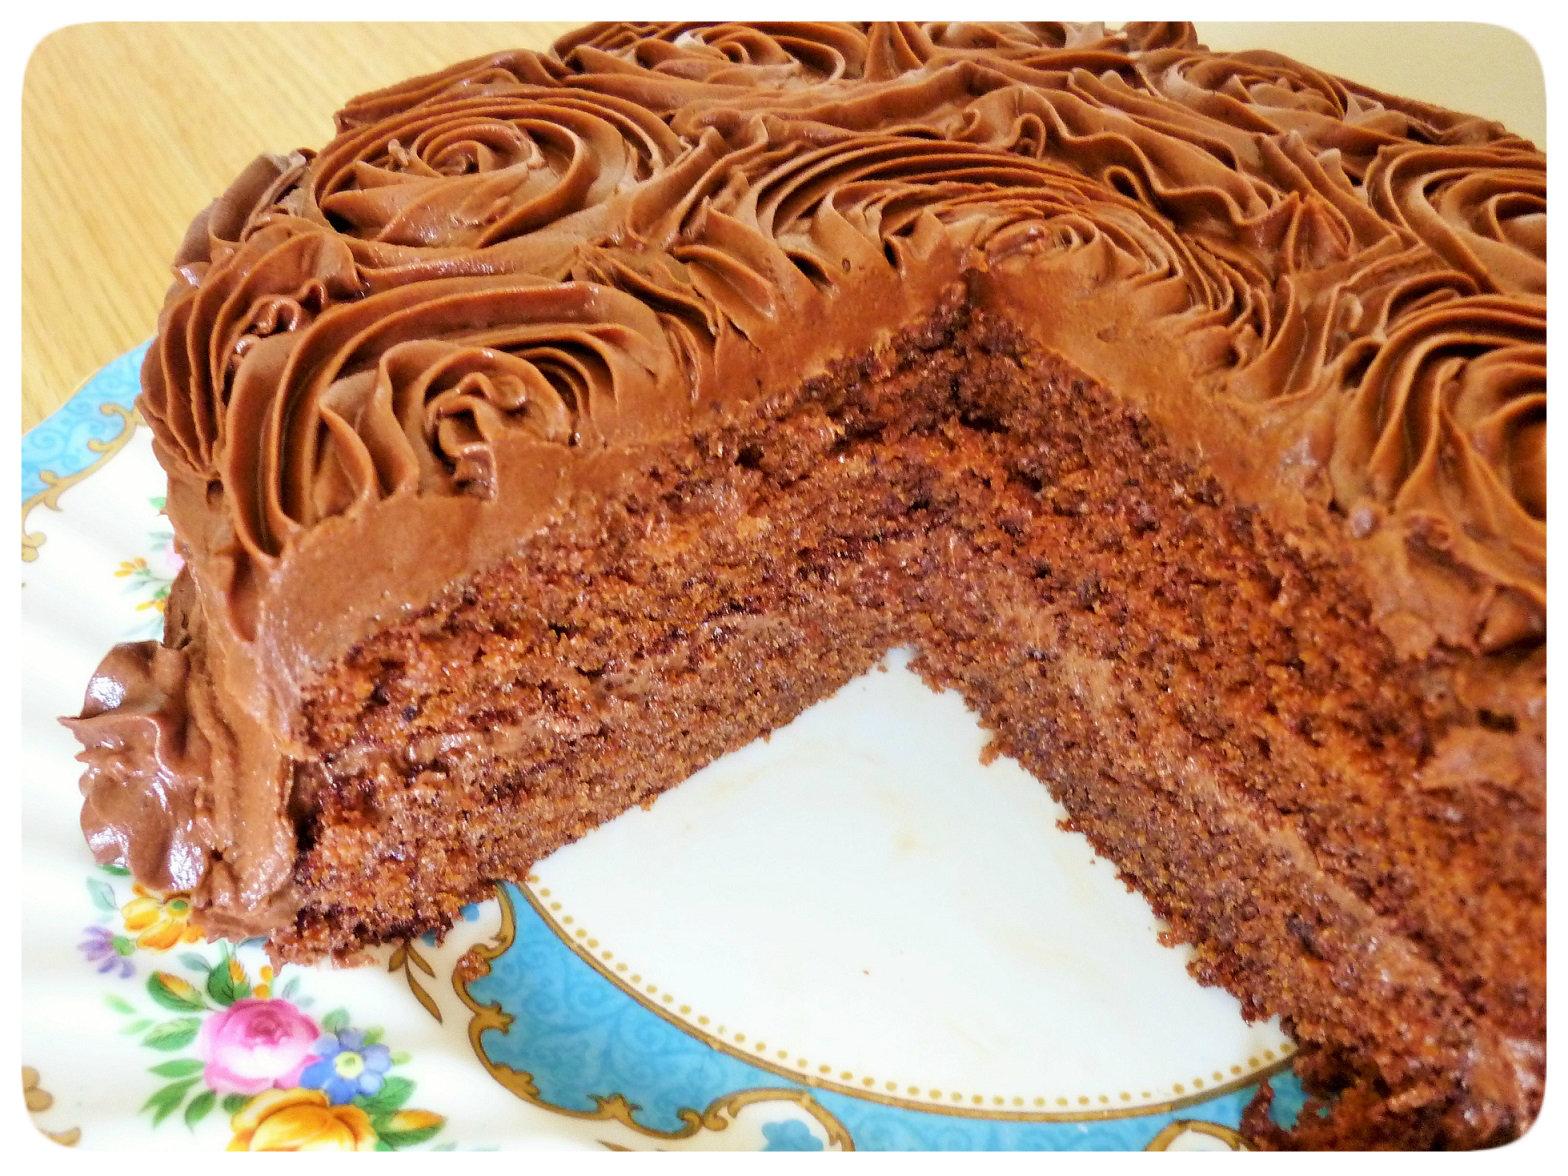 Chocolate Buttercream Icing Recipe For Cake Decorating